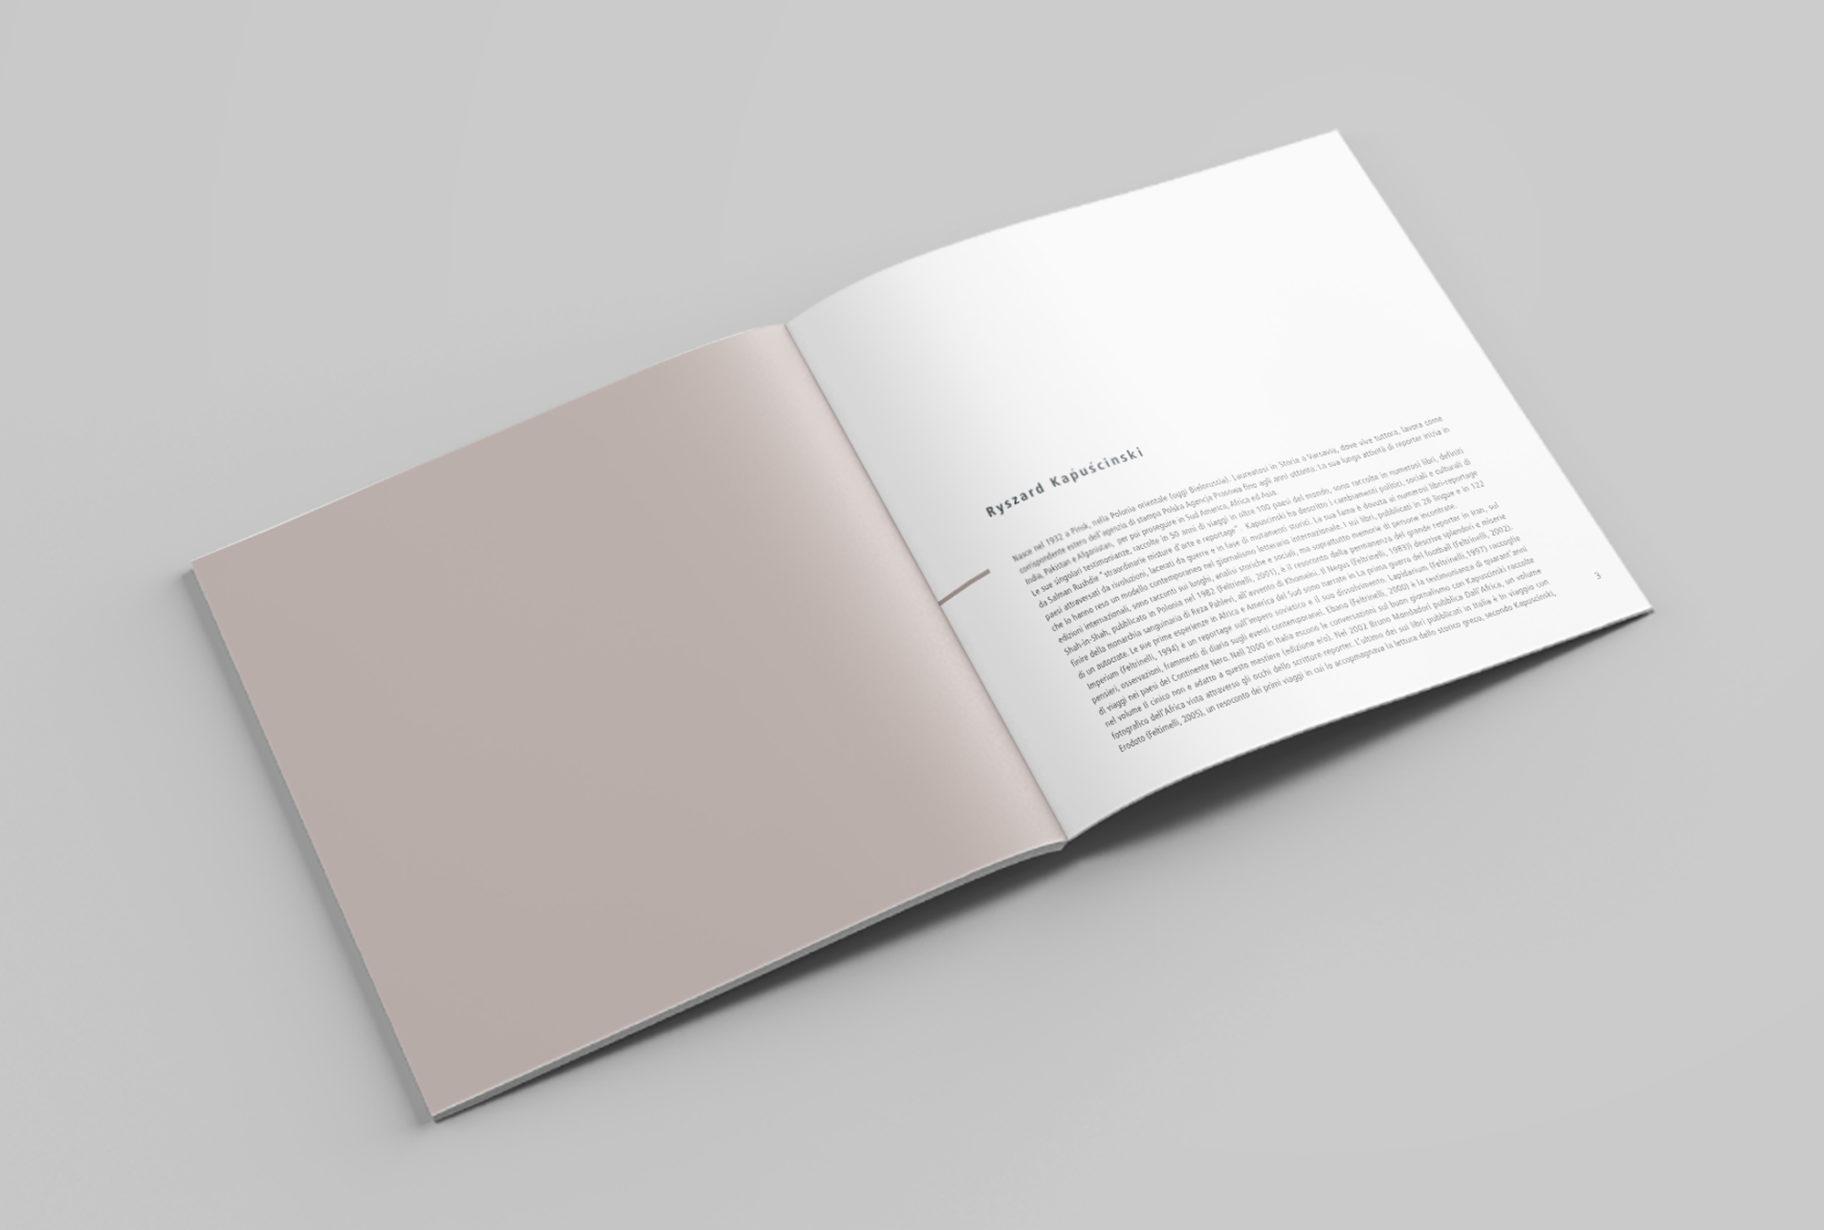 cenobio-kapuscinski-brochure-03